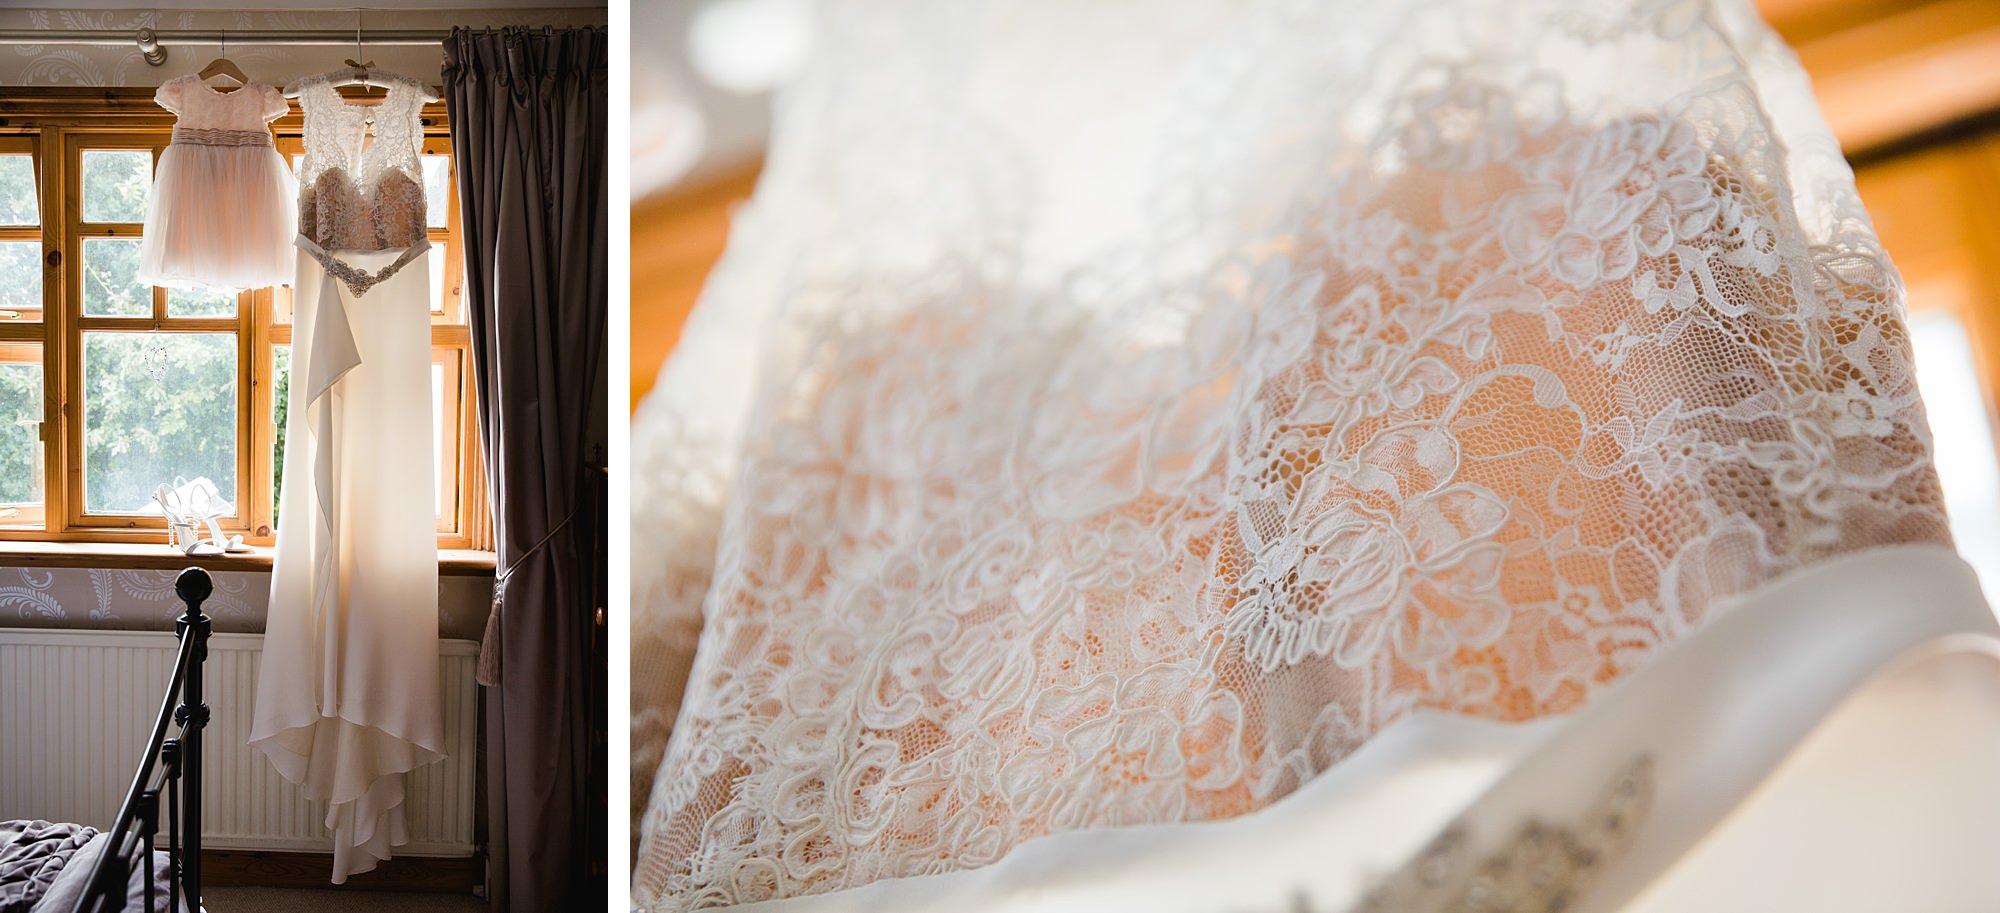 Writtle university college wedding bride's handmade dress